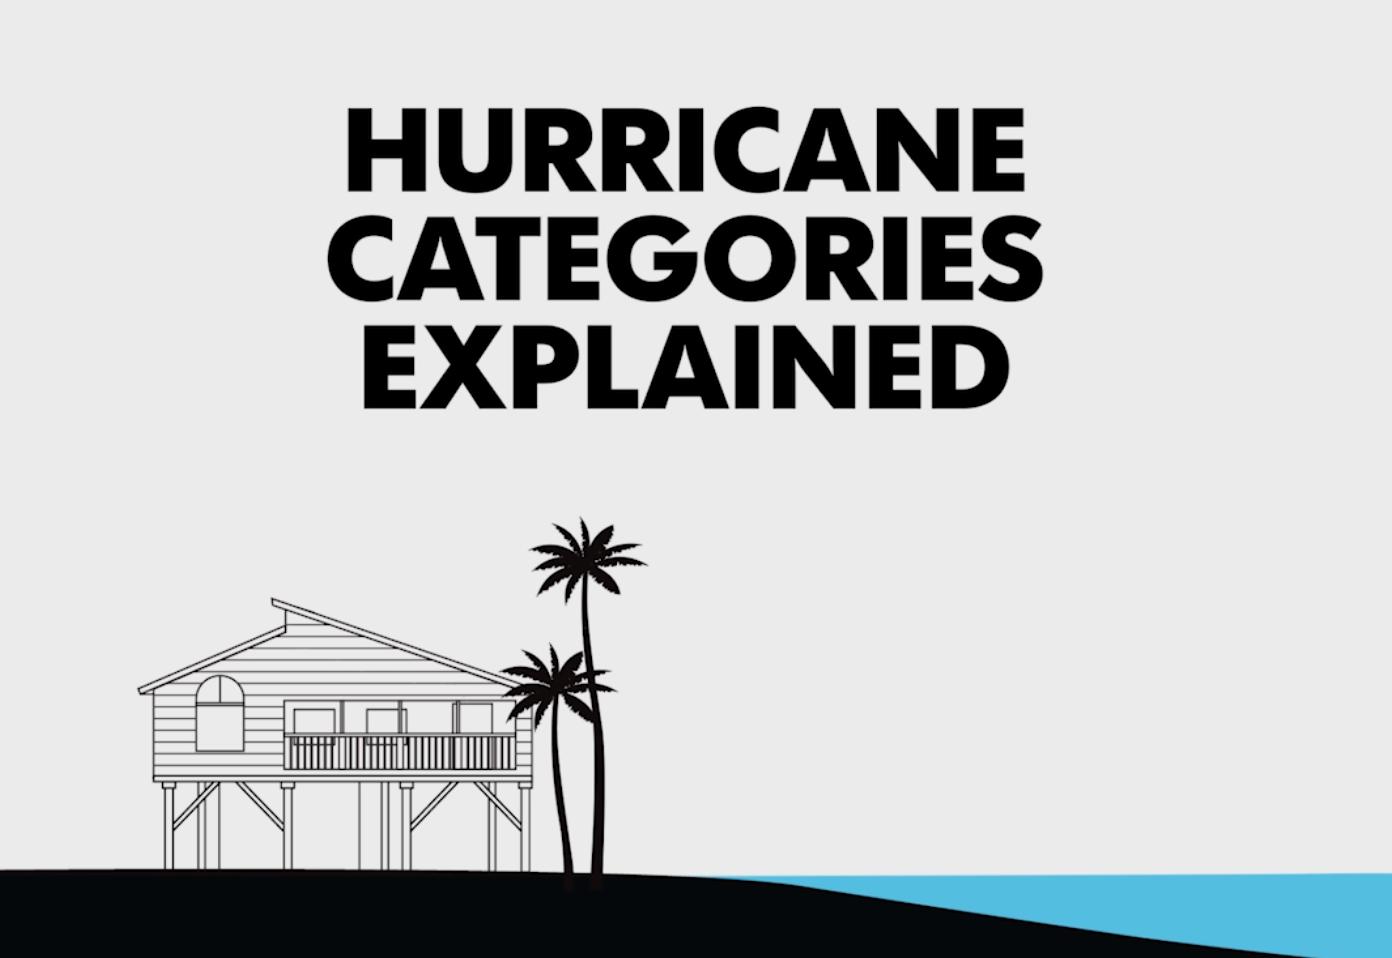 Video: Hurricane categories explained